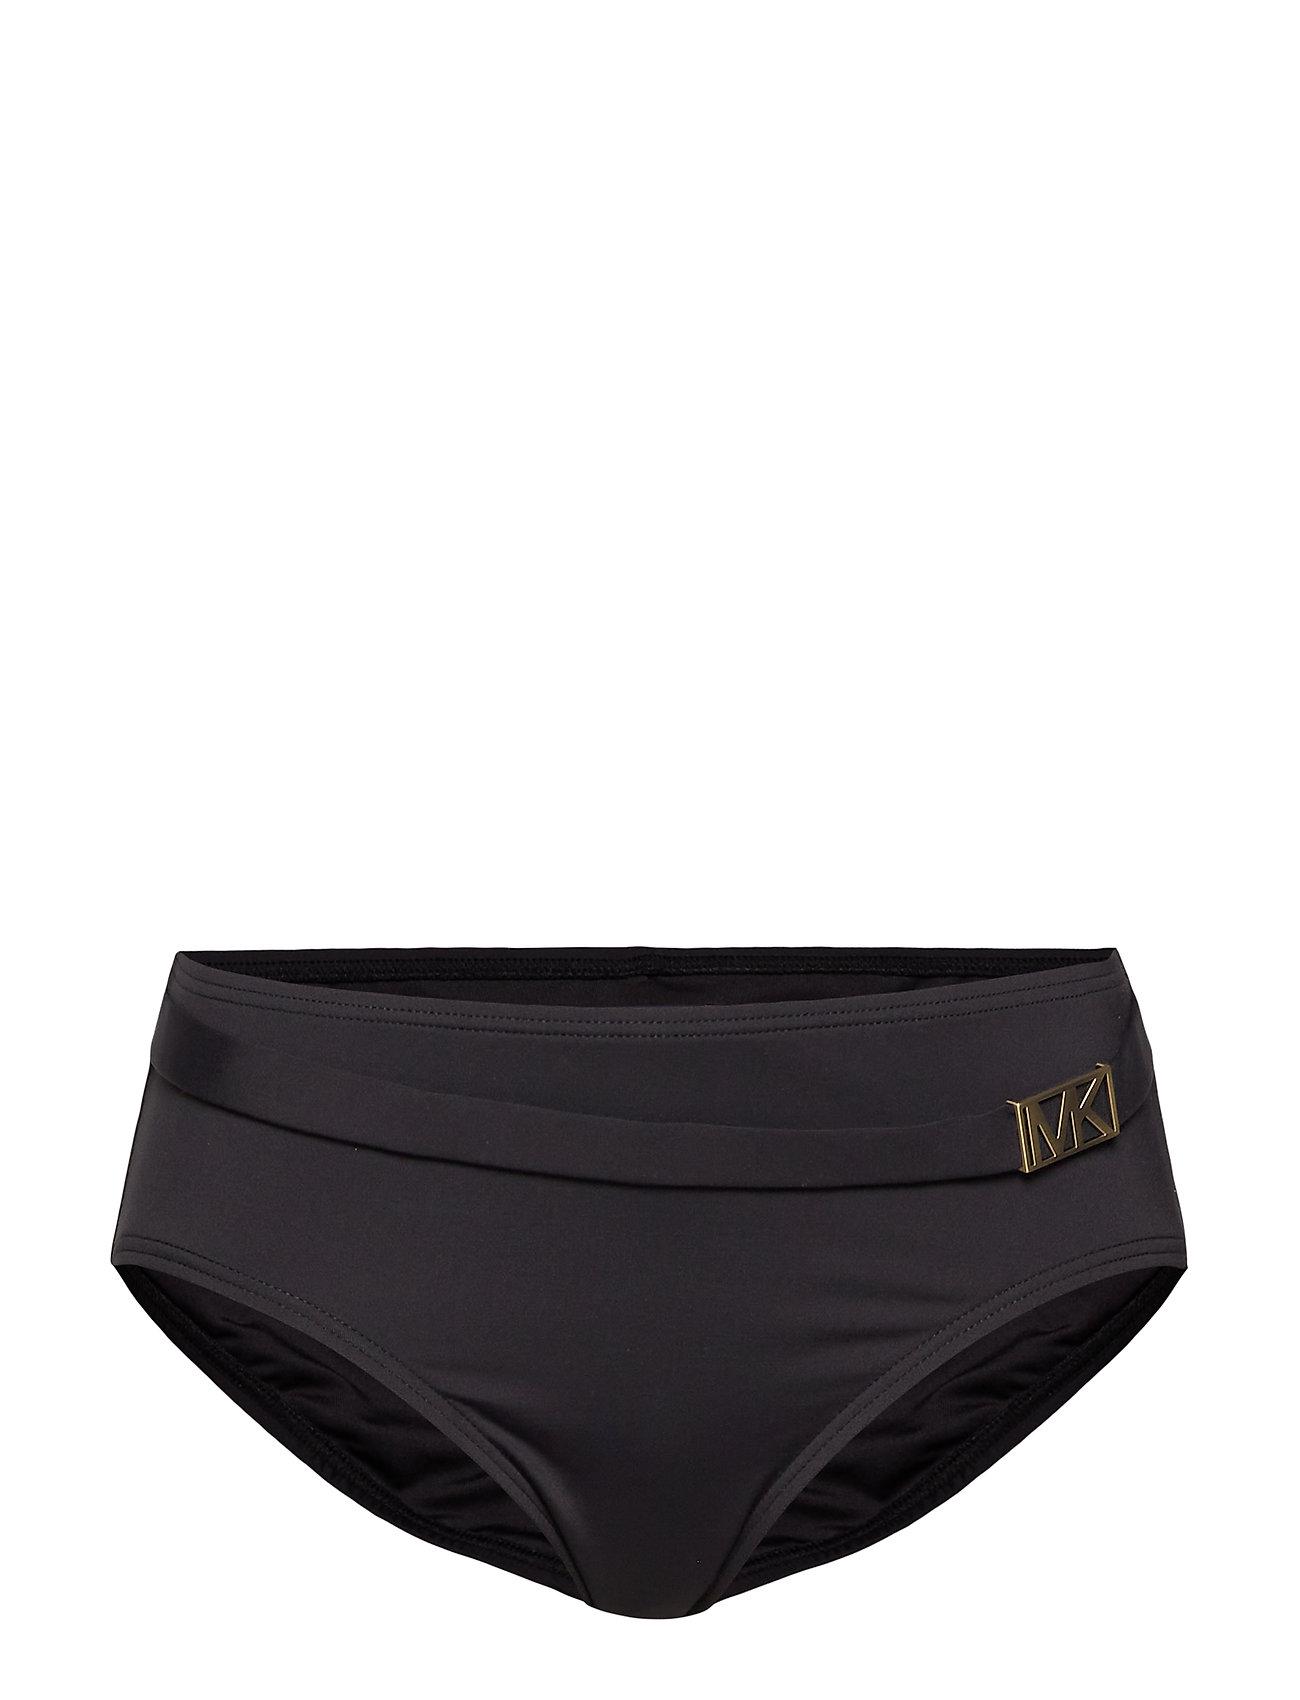 Michael Kors Swimwear BELTED BTM - BLACK